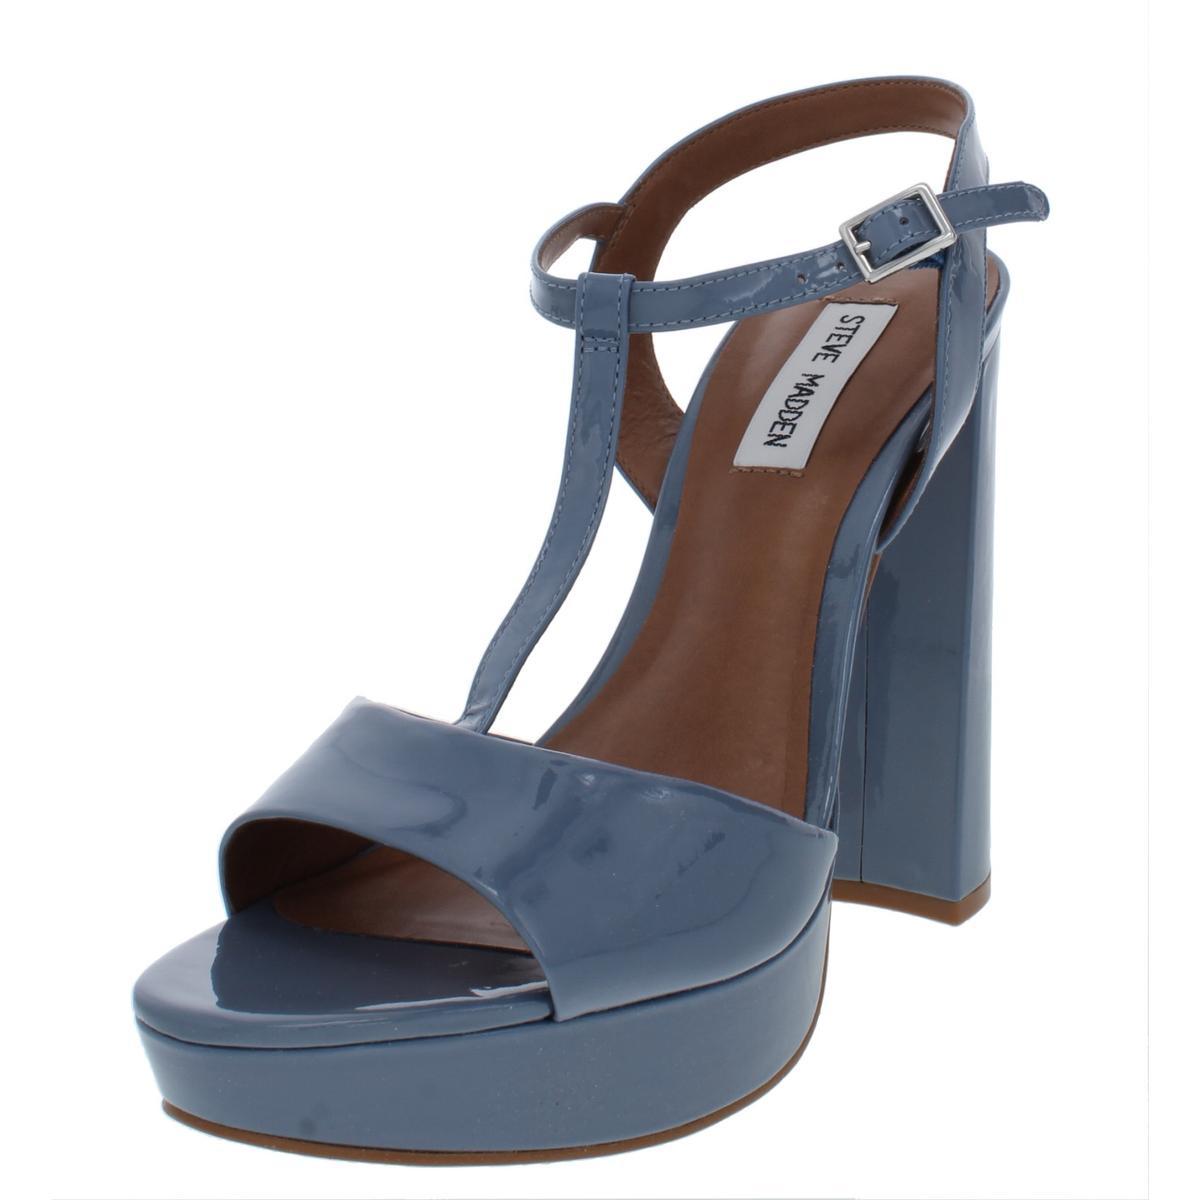 e7fe0f1a2b6 Details about Steve Madden Womens Kinder Blue Platform Sandals Shoes 10  Medium (B